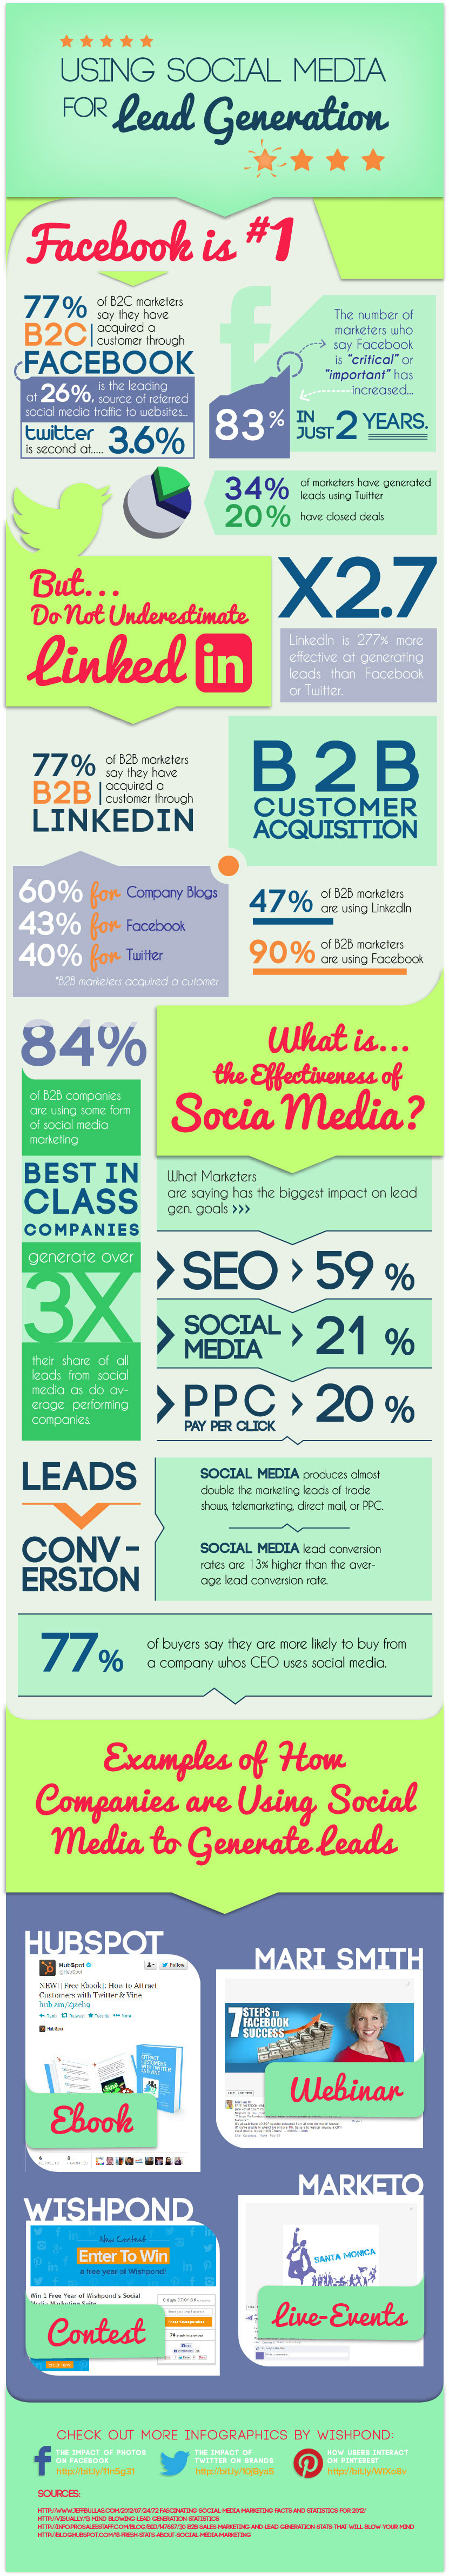 L'importance du social media dans le marketing B2B